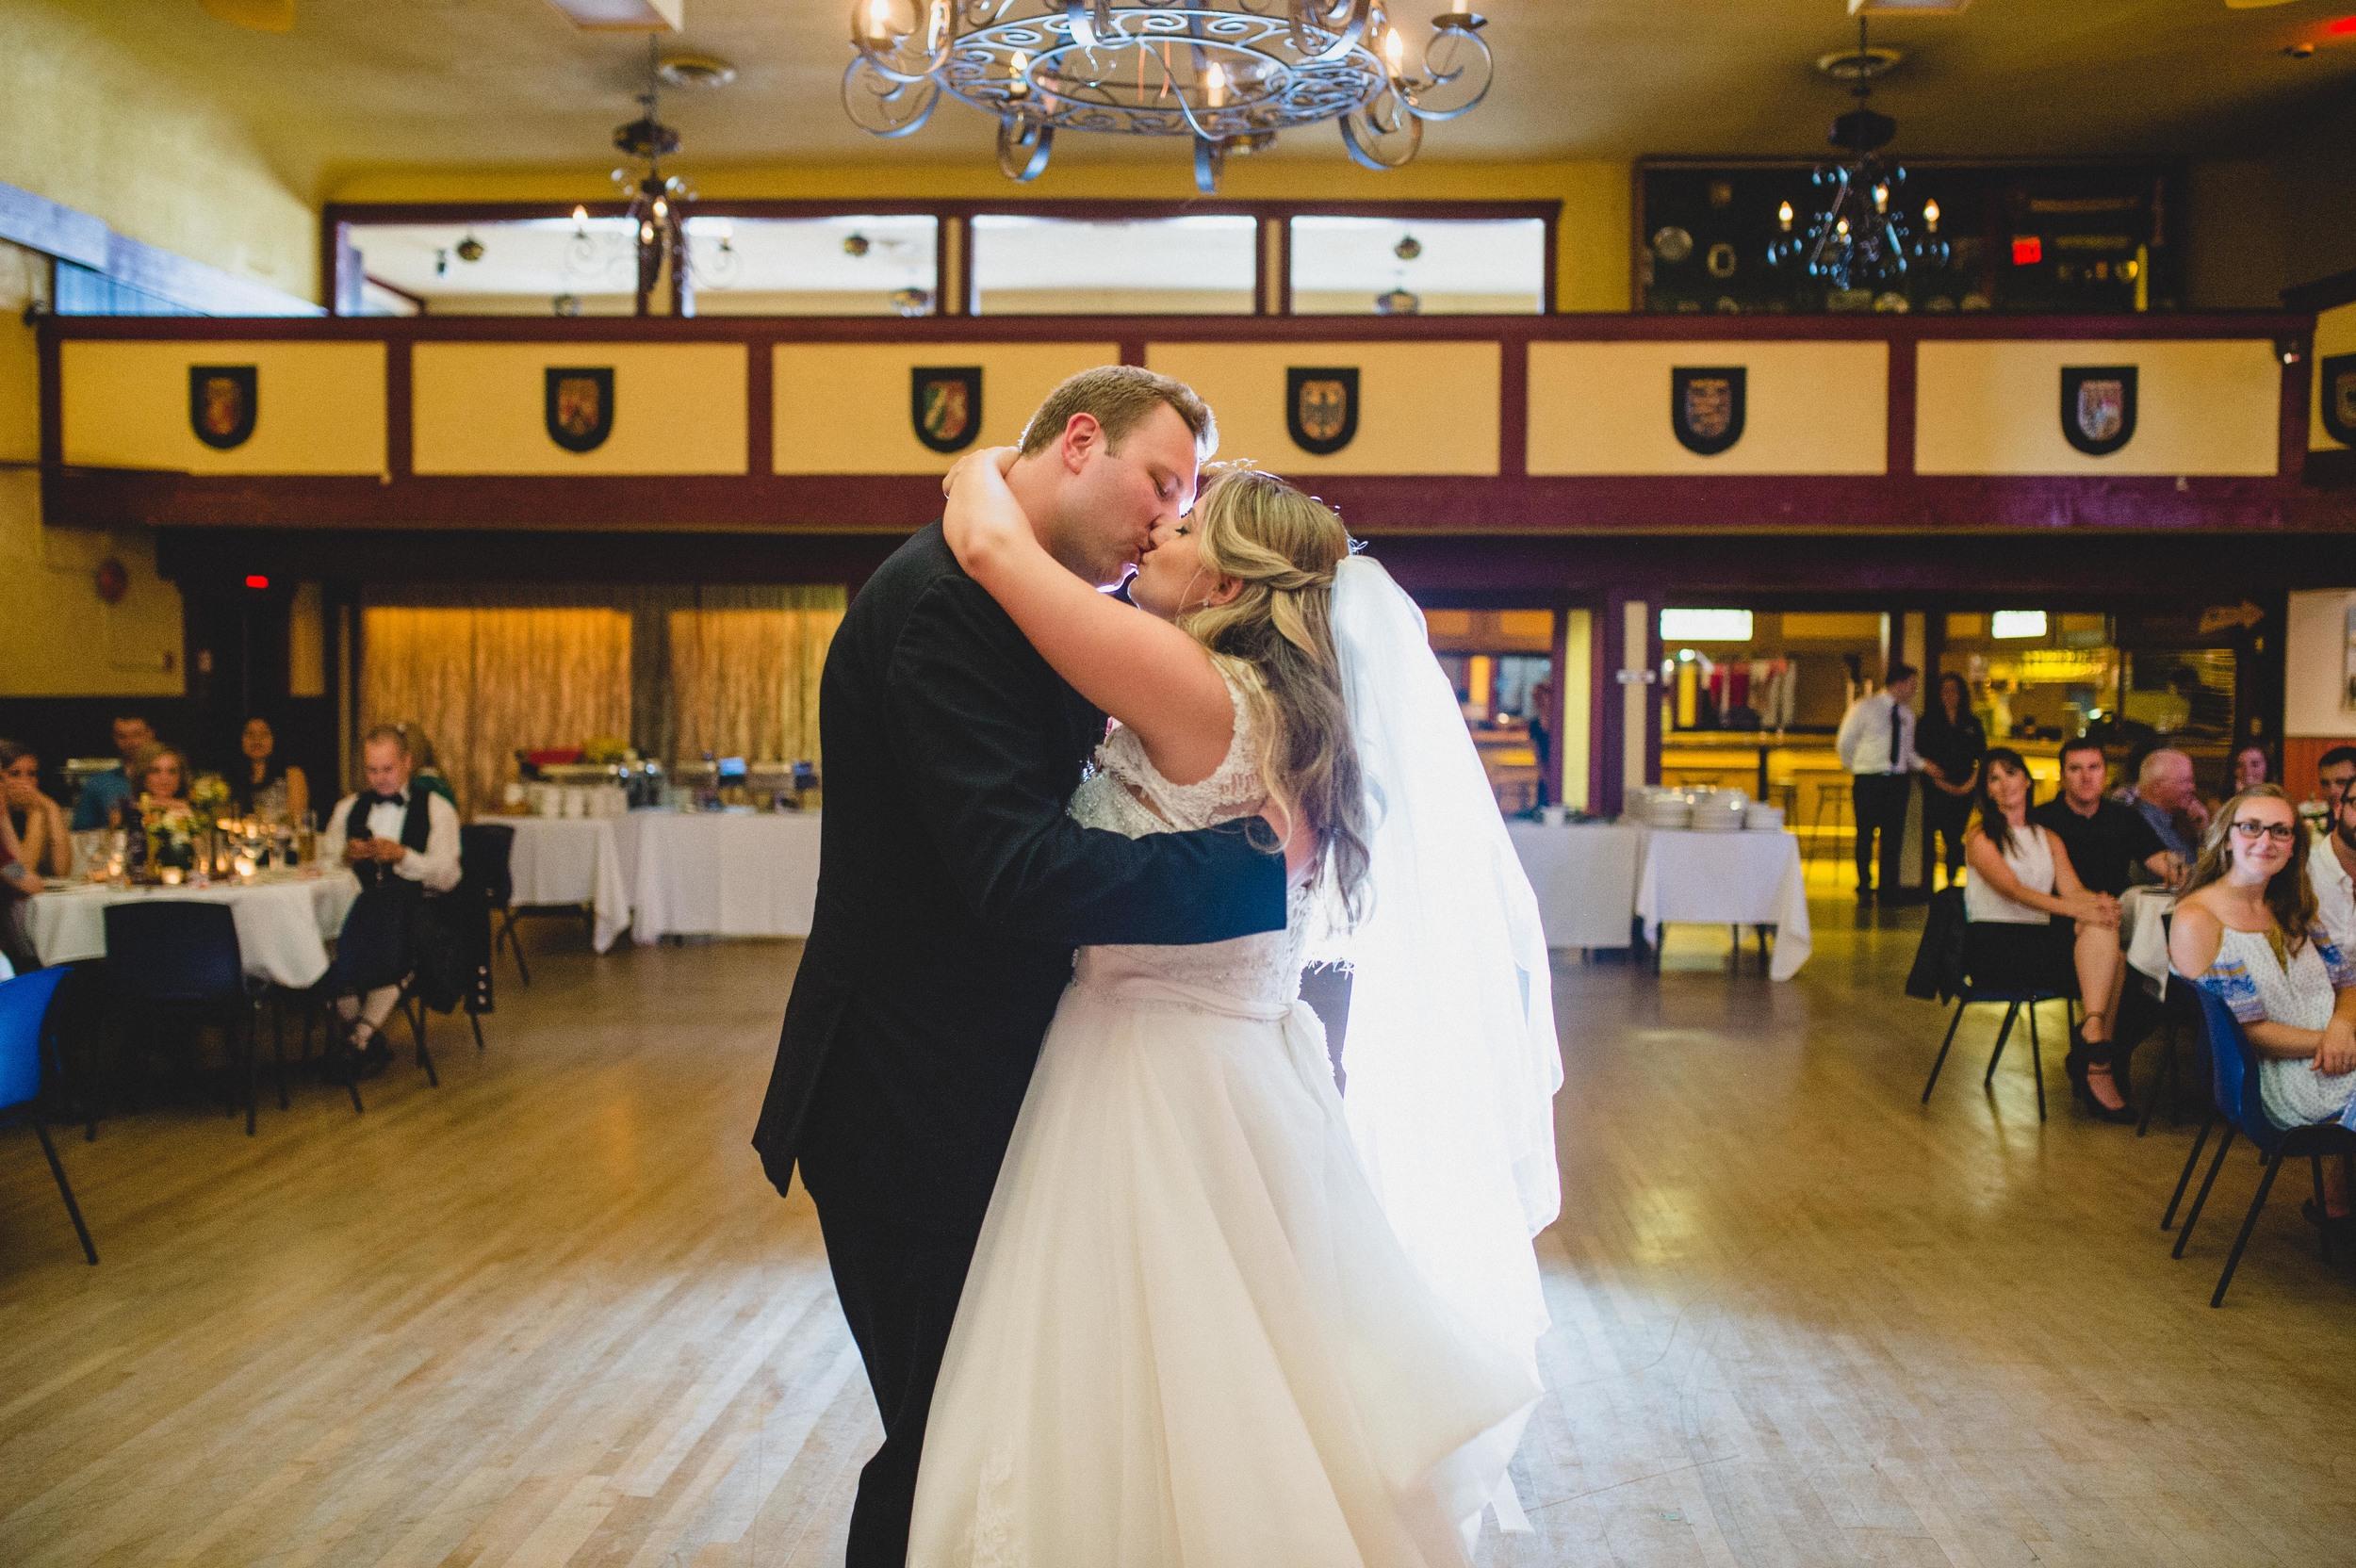 Vancouver St Augustine 's Church wedding photographer edward lai photography-76.jpg